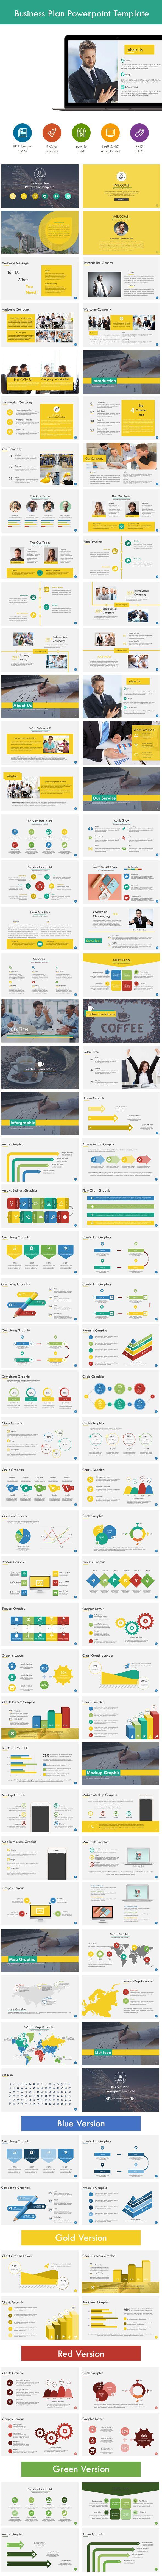 Business Plan Powerpoint Presentation Template #slides Download: http://graphicriver.net/item/business-plan-powerpoint/14475585?ref=ksioks